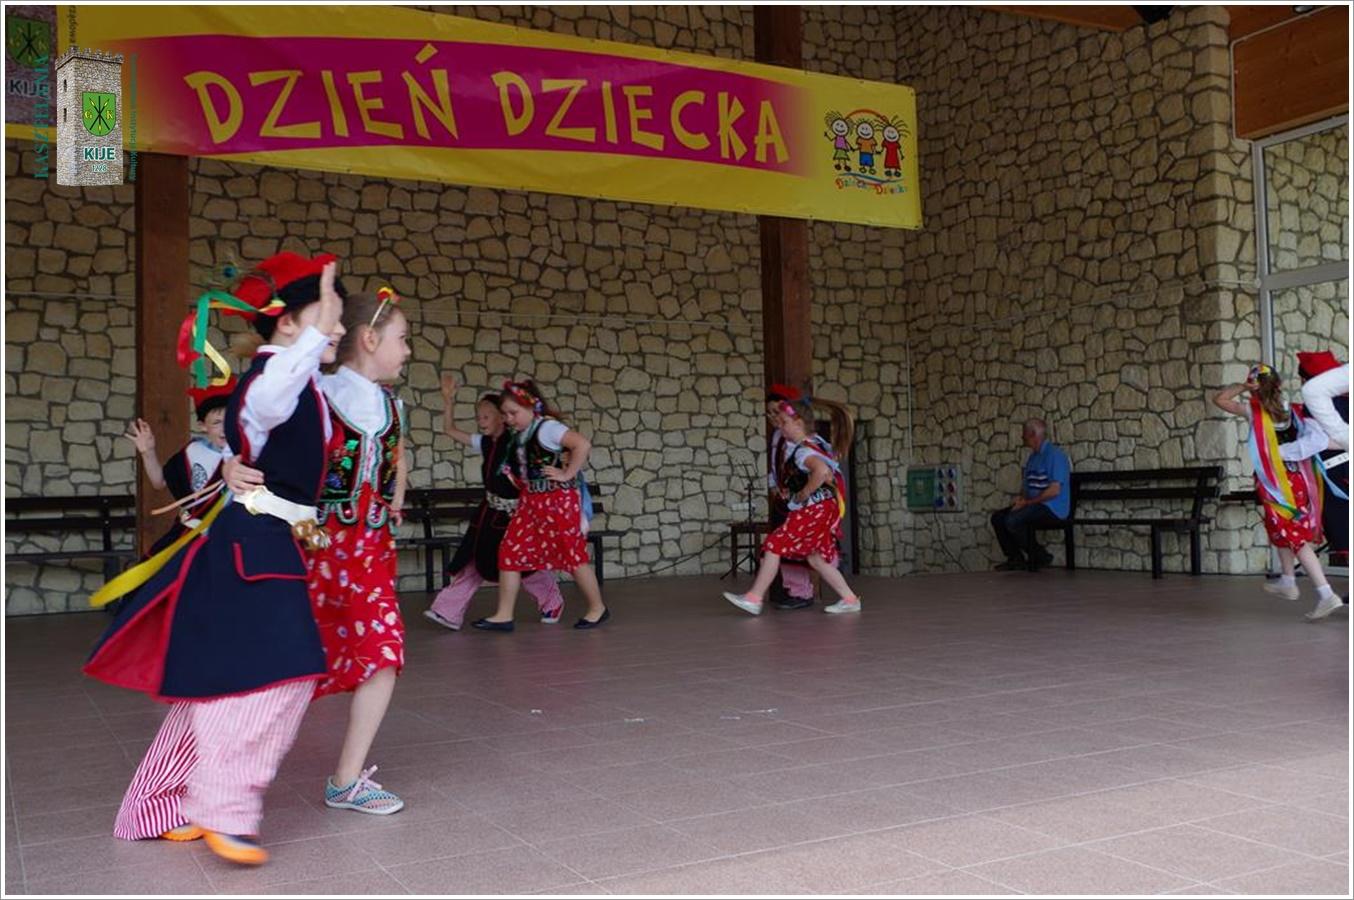 images/galleries/imprezy/2017/dzien_dziecka2017/IMGP0829 (Copy)